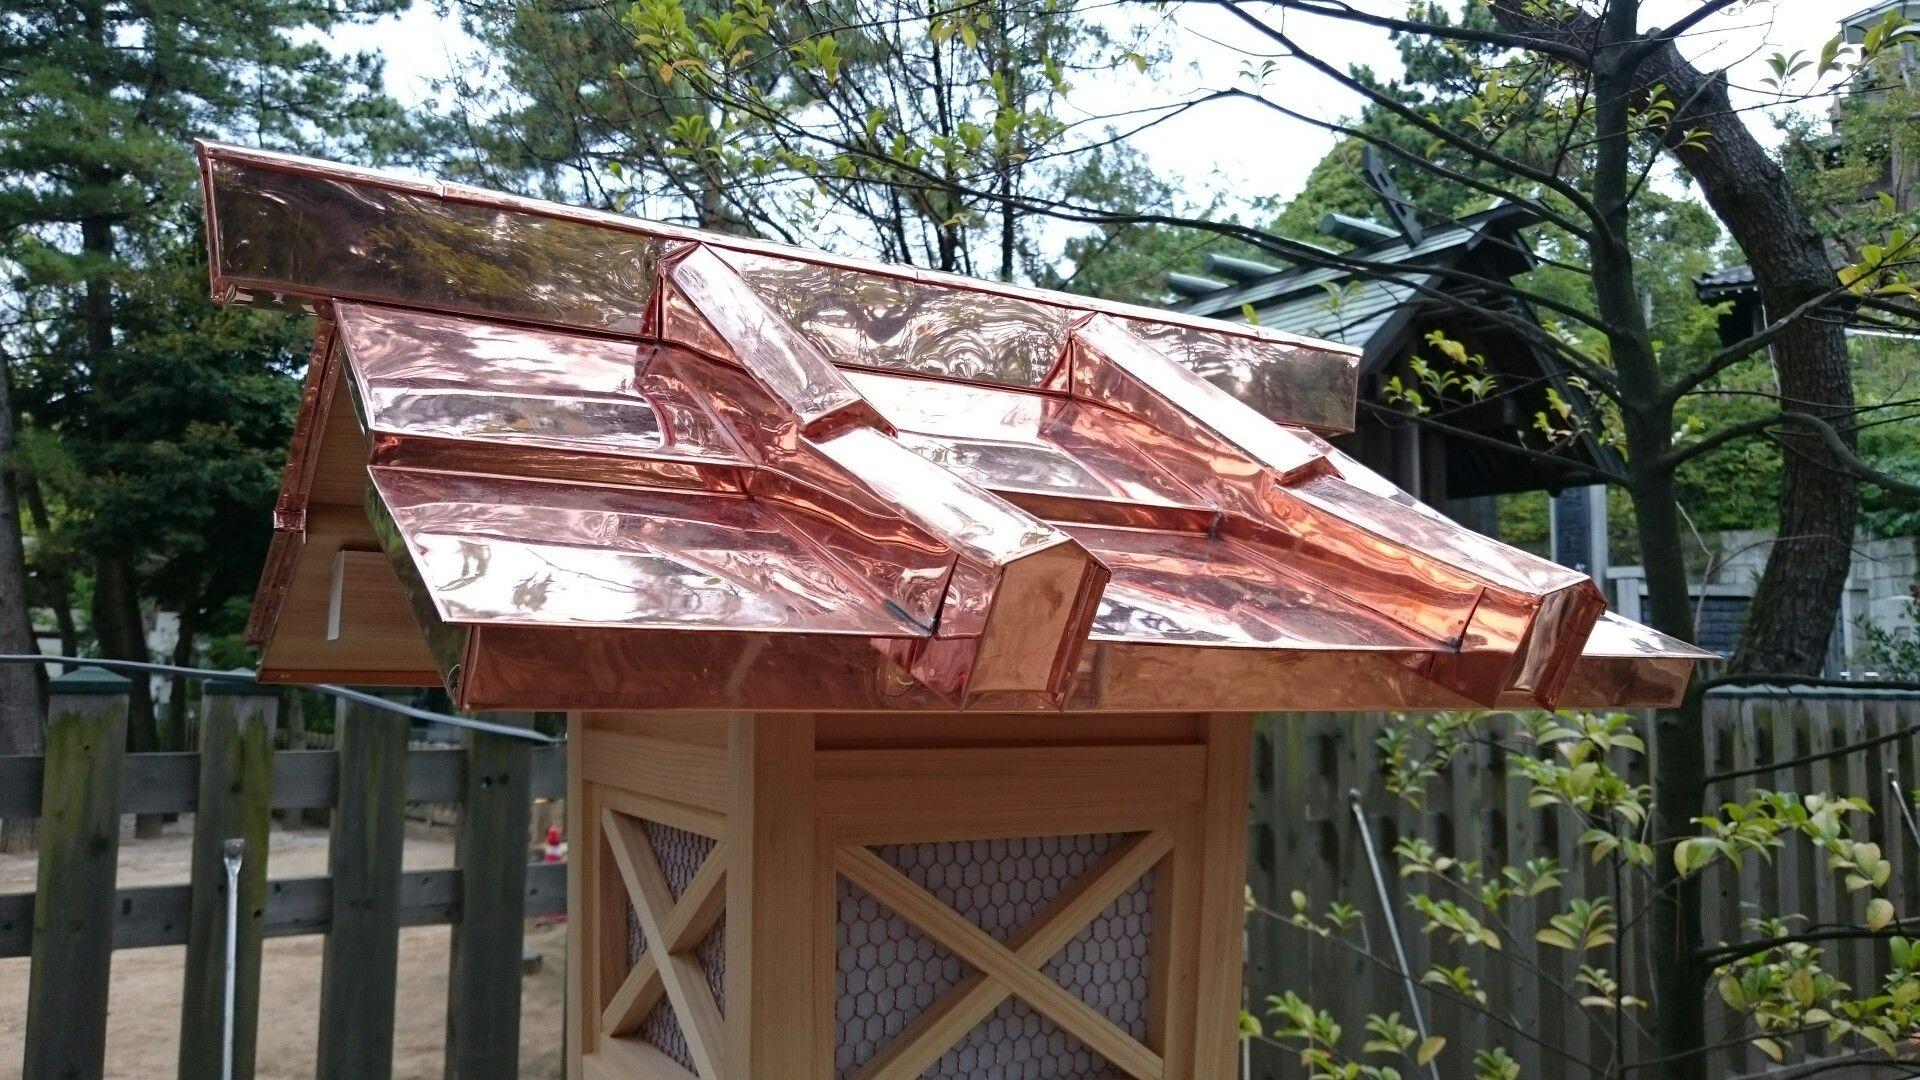 Carskij Kirpich Https Www Ruskir Ru Ruchnoj Raboty Mozhete Stat Dilerom Metal Roof Construction Copper Metal Roof Copper Roof